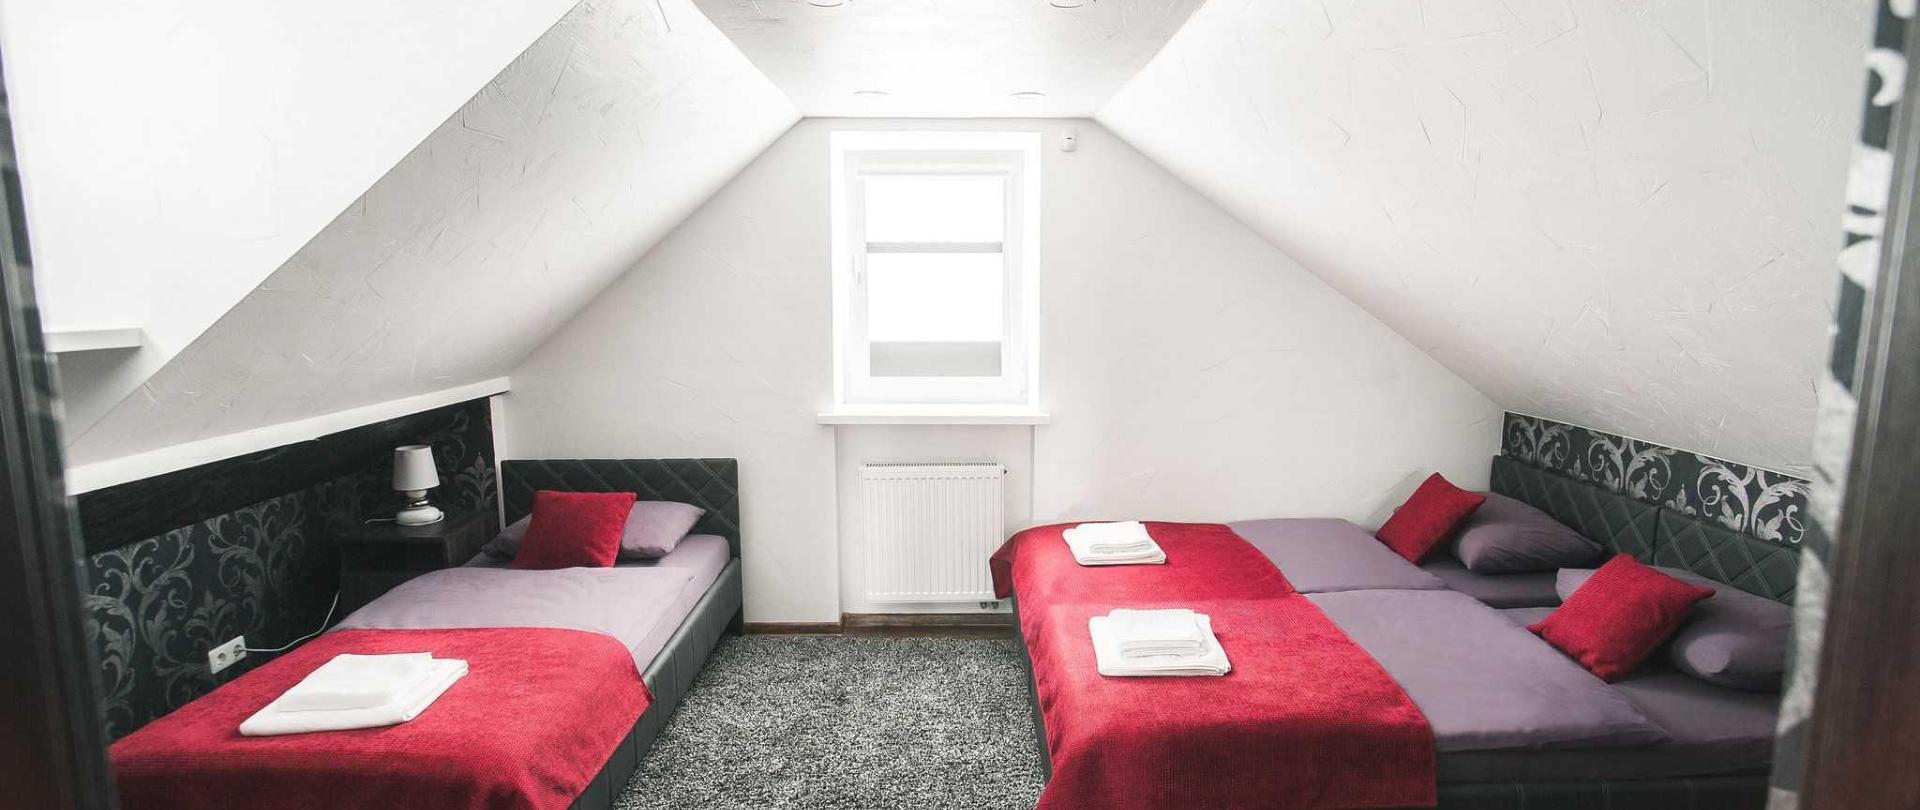 sky-bedroom-1.JPG